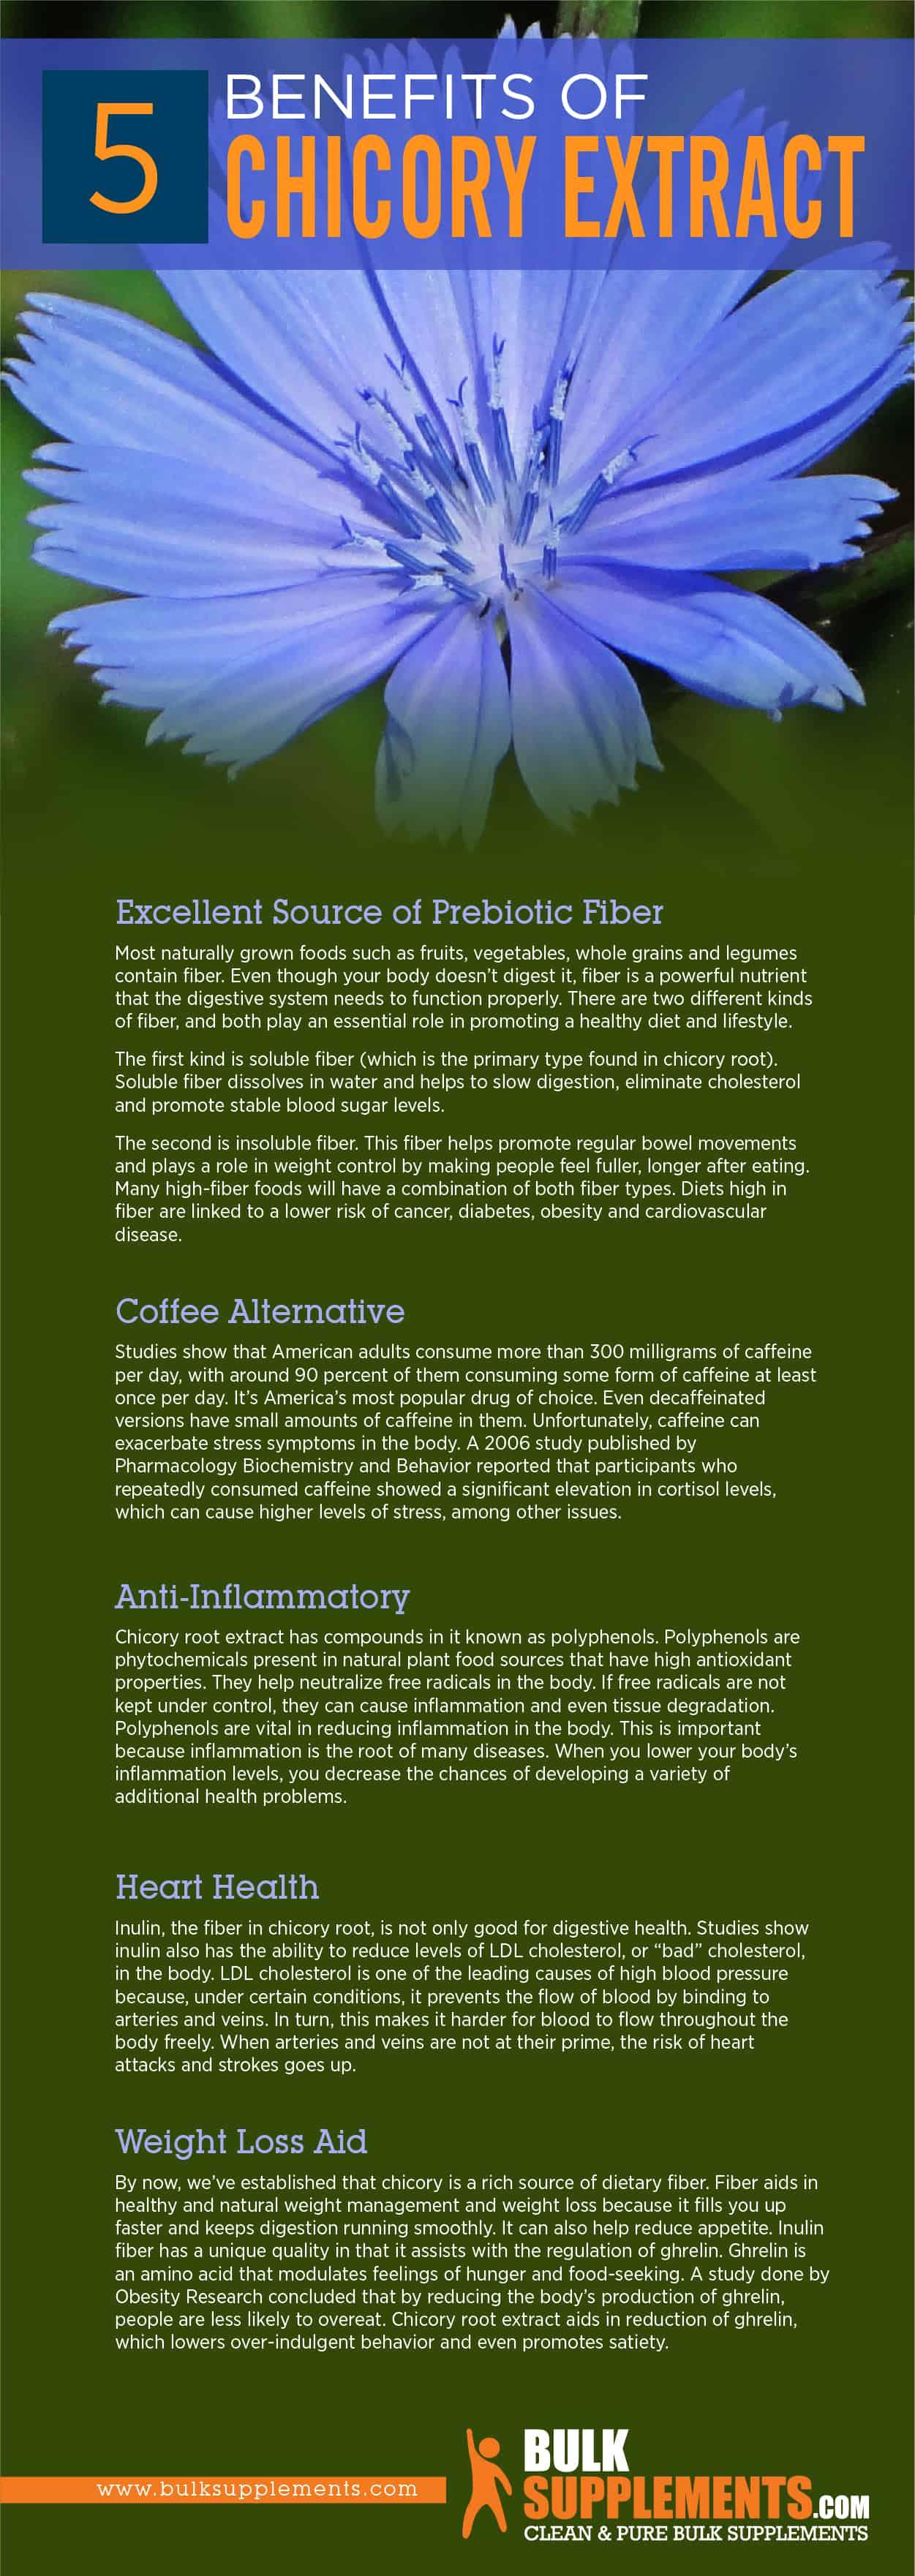 Chicory Extract Benefits